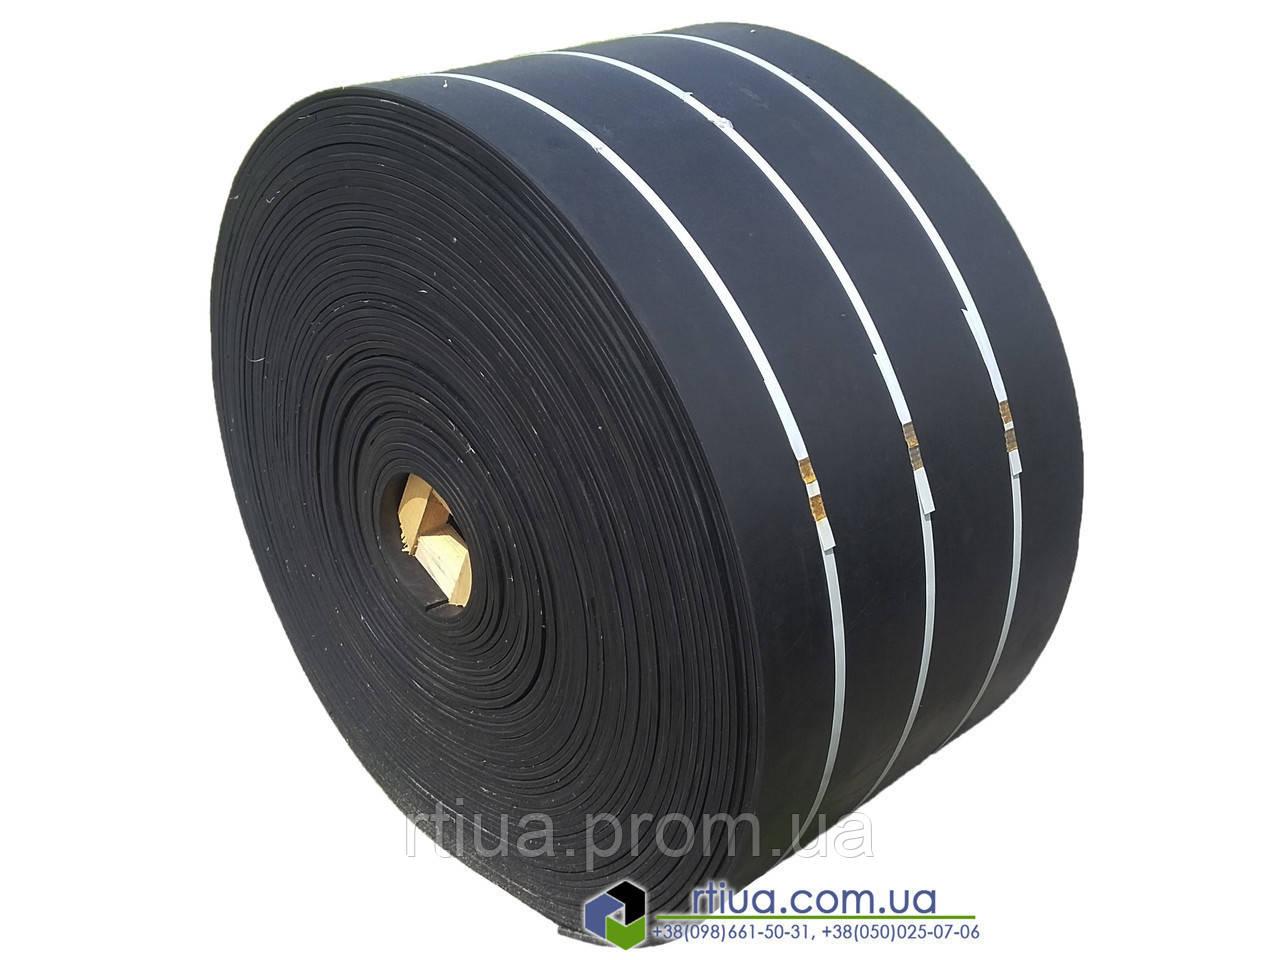 Конвейерная лента 1400х10 мм